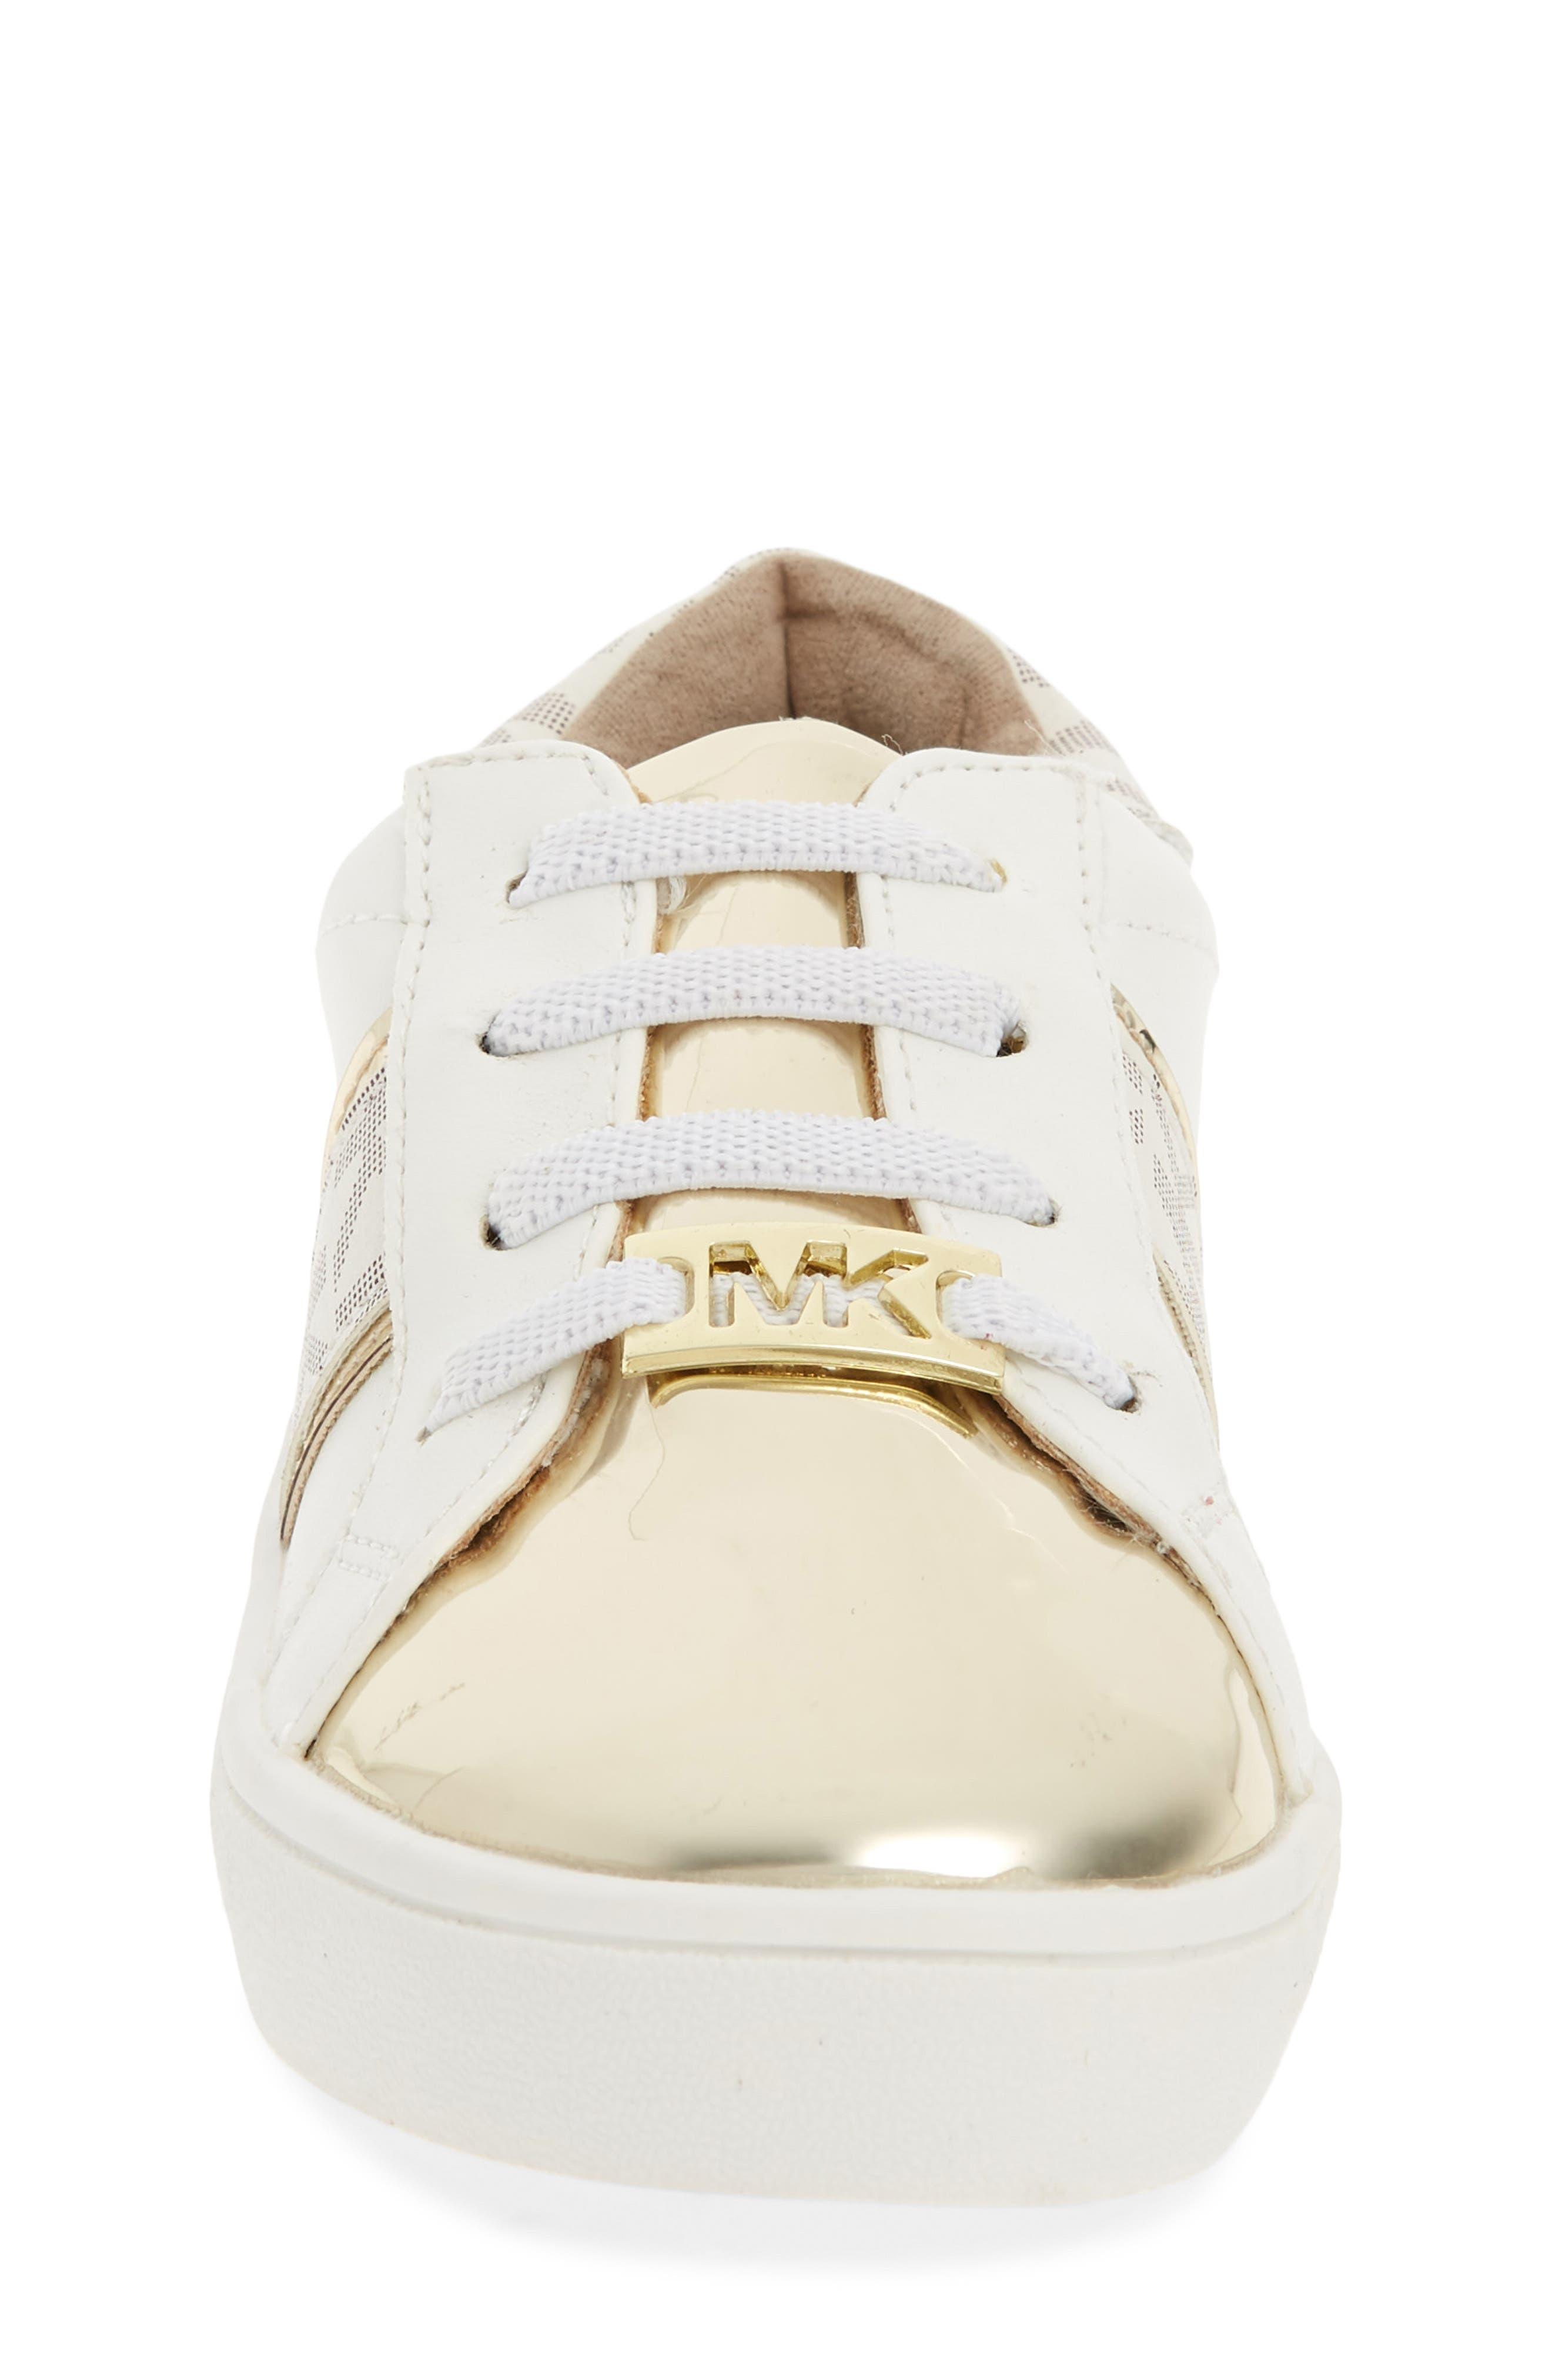 MICHAEL MICHAEL KORS,                             Ivy Frankie Metallic Logo Sneaker,                             Alternate thumbnail 4, color,                             100